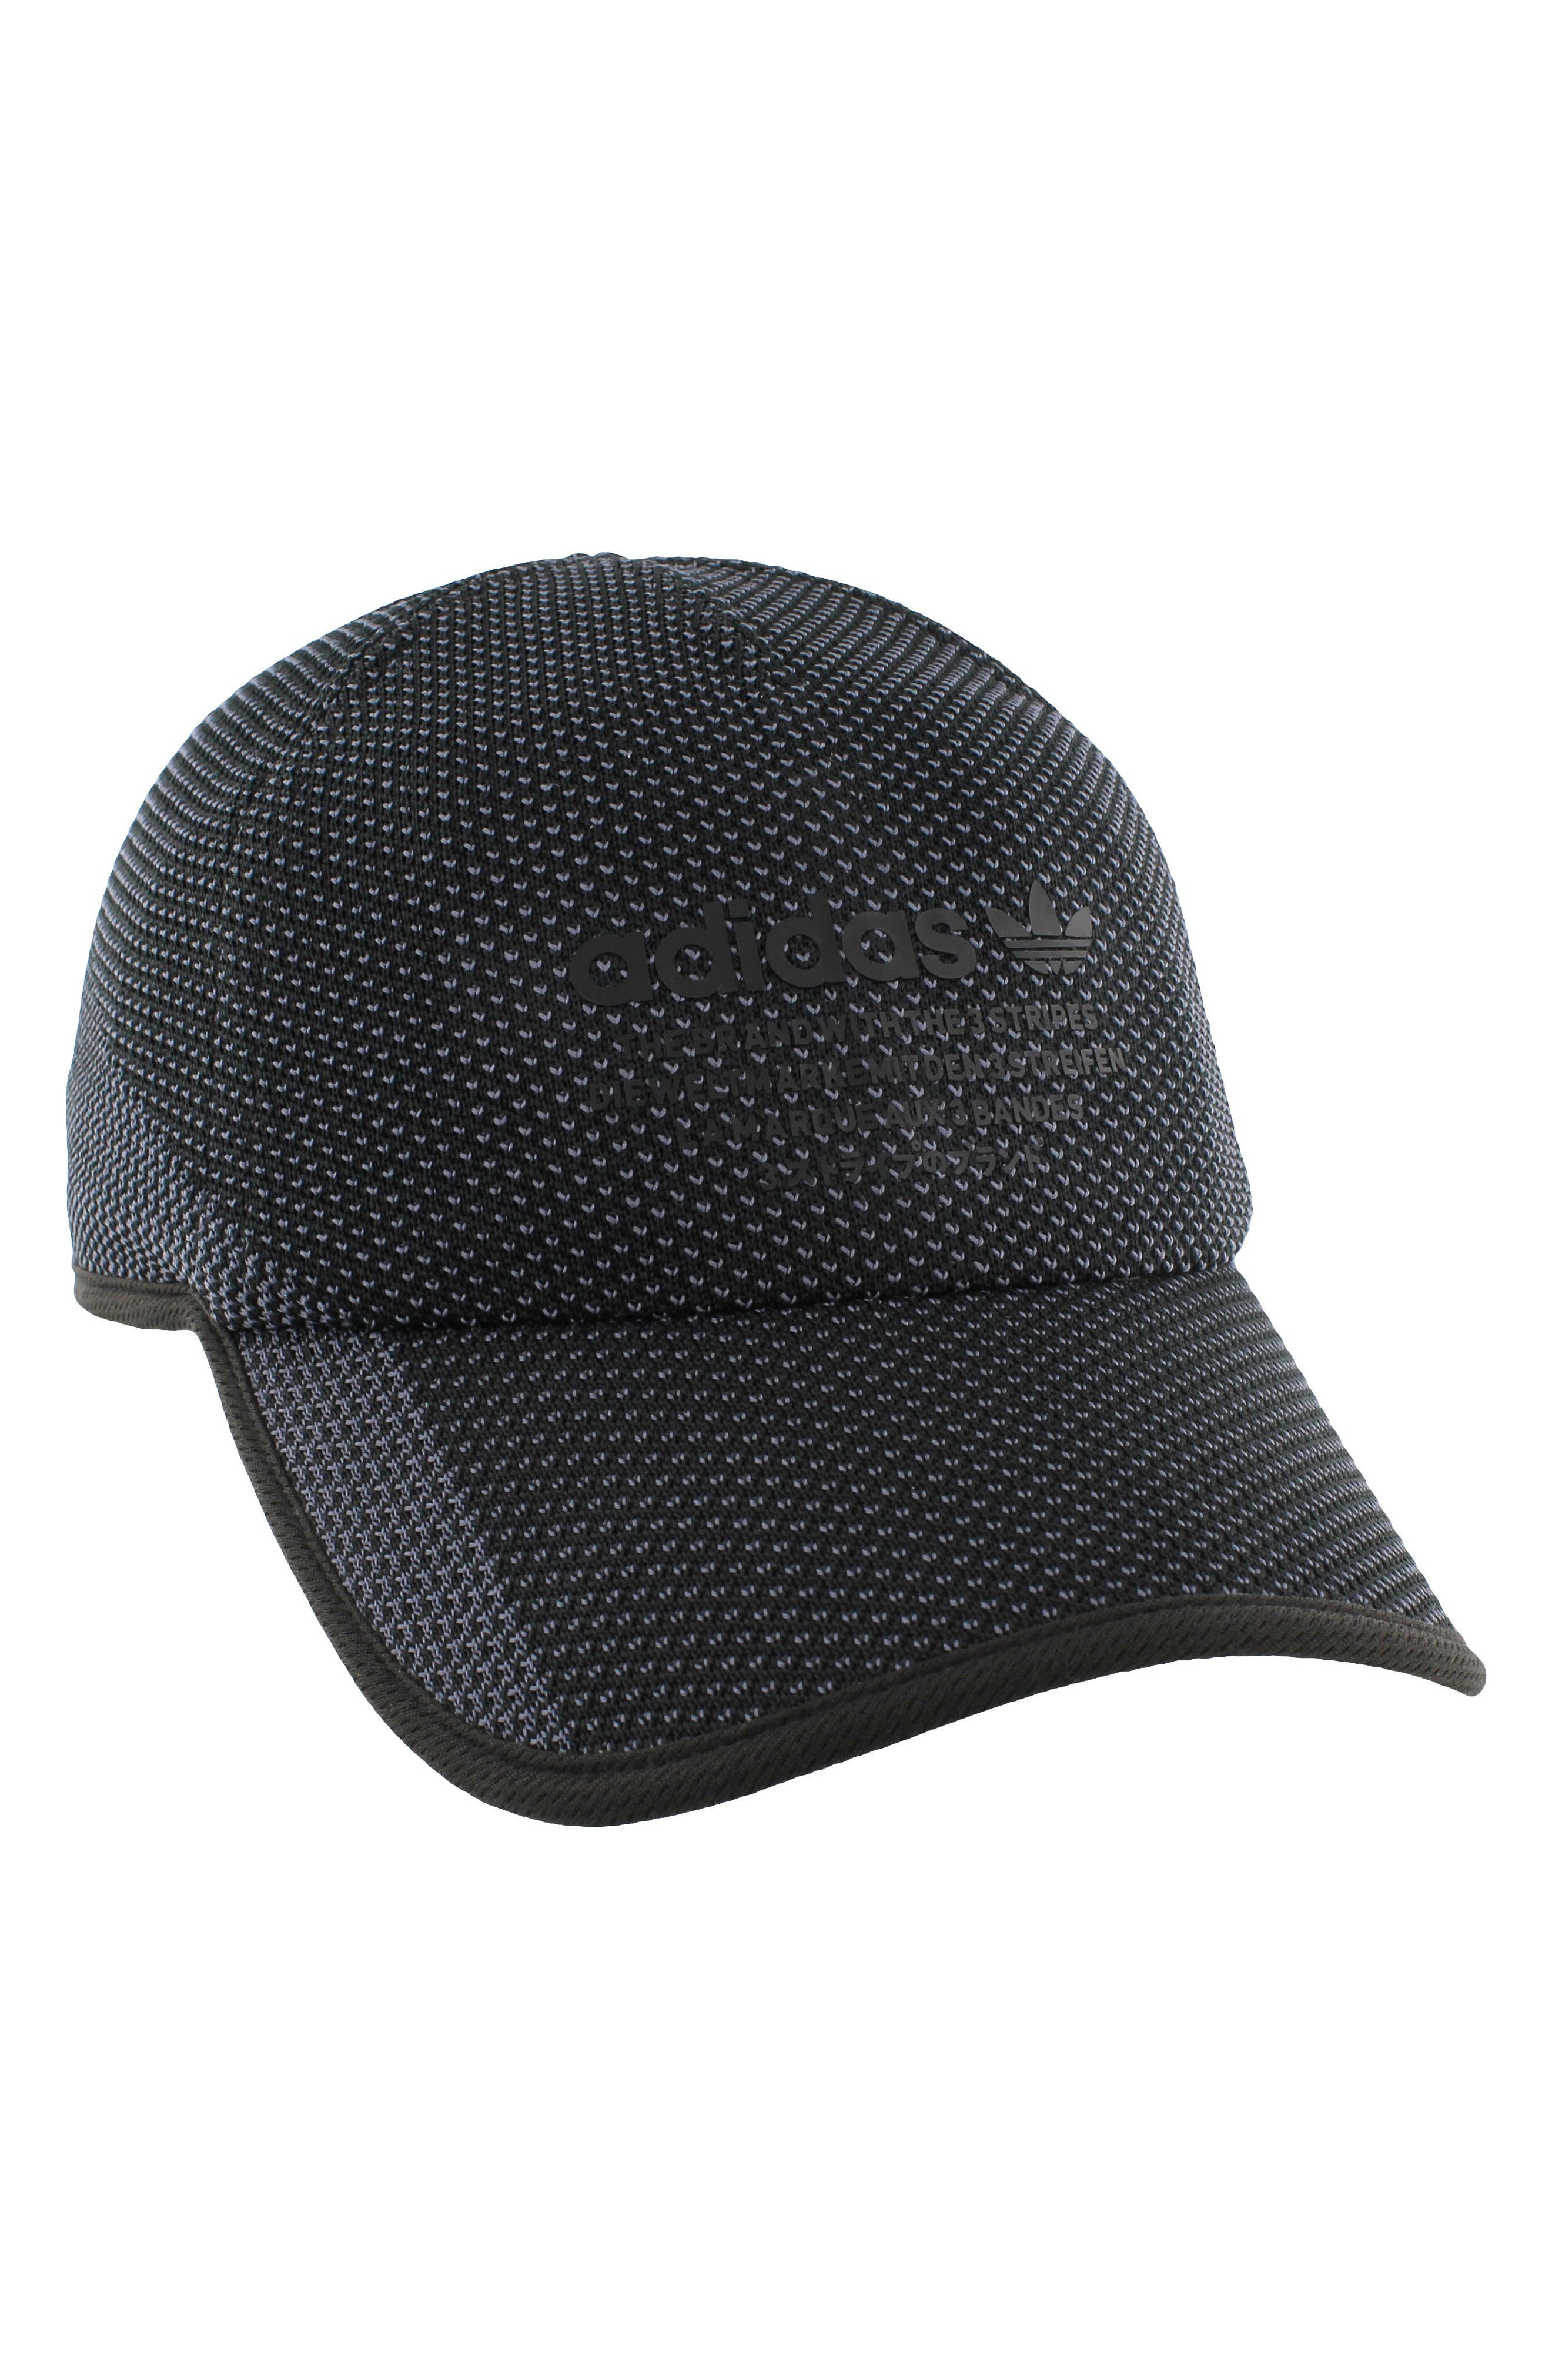 NMD Prime Ball Cap,                             Alternate thumbnail 7, color,                             Black